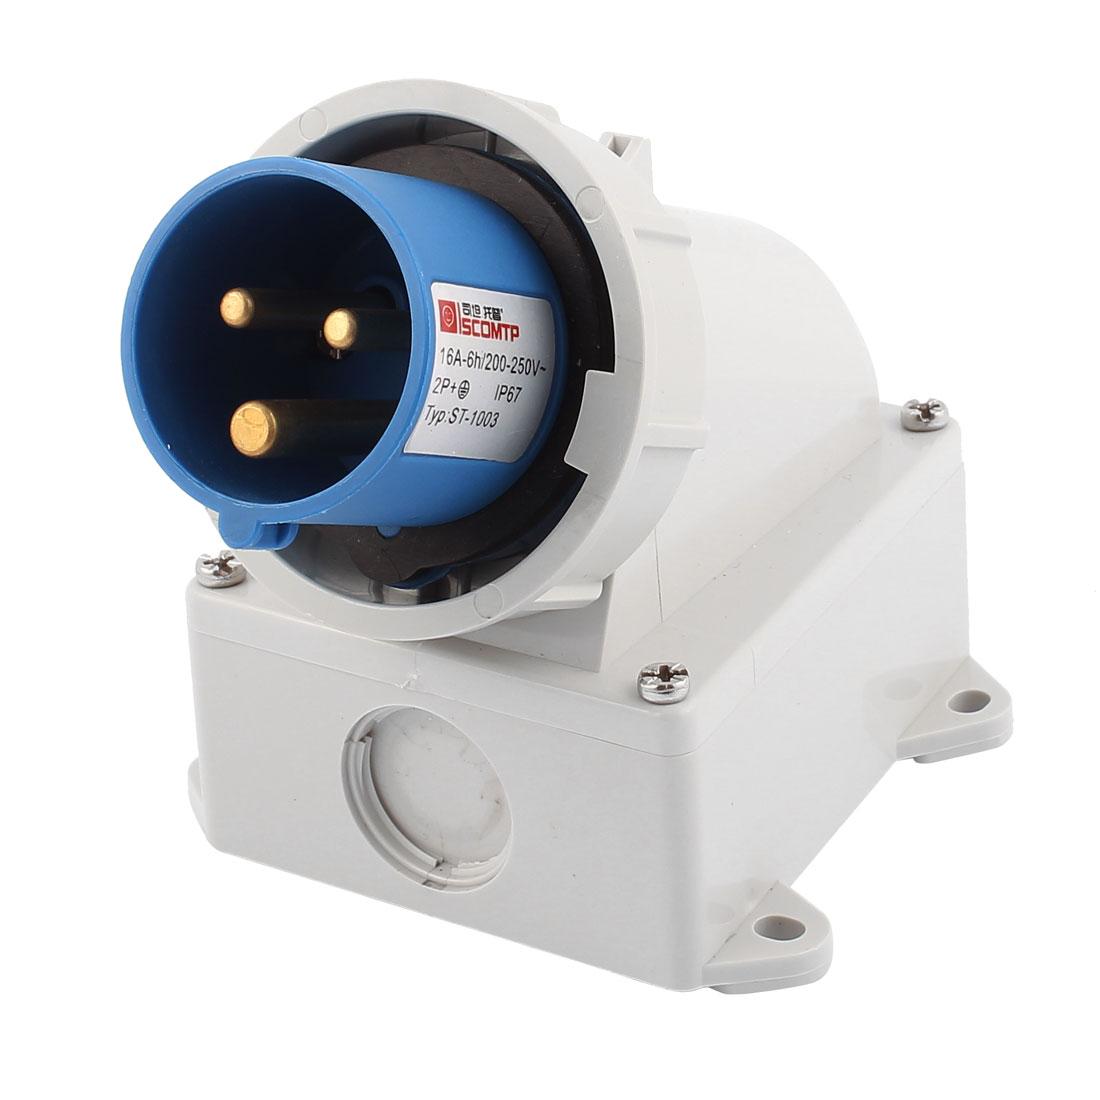 AC 200V-250V 16A IP67 2P+E 3-Terminal Male Industrial Caravan Plug